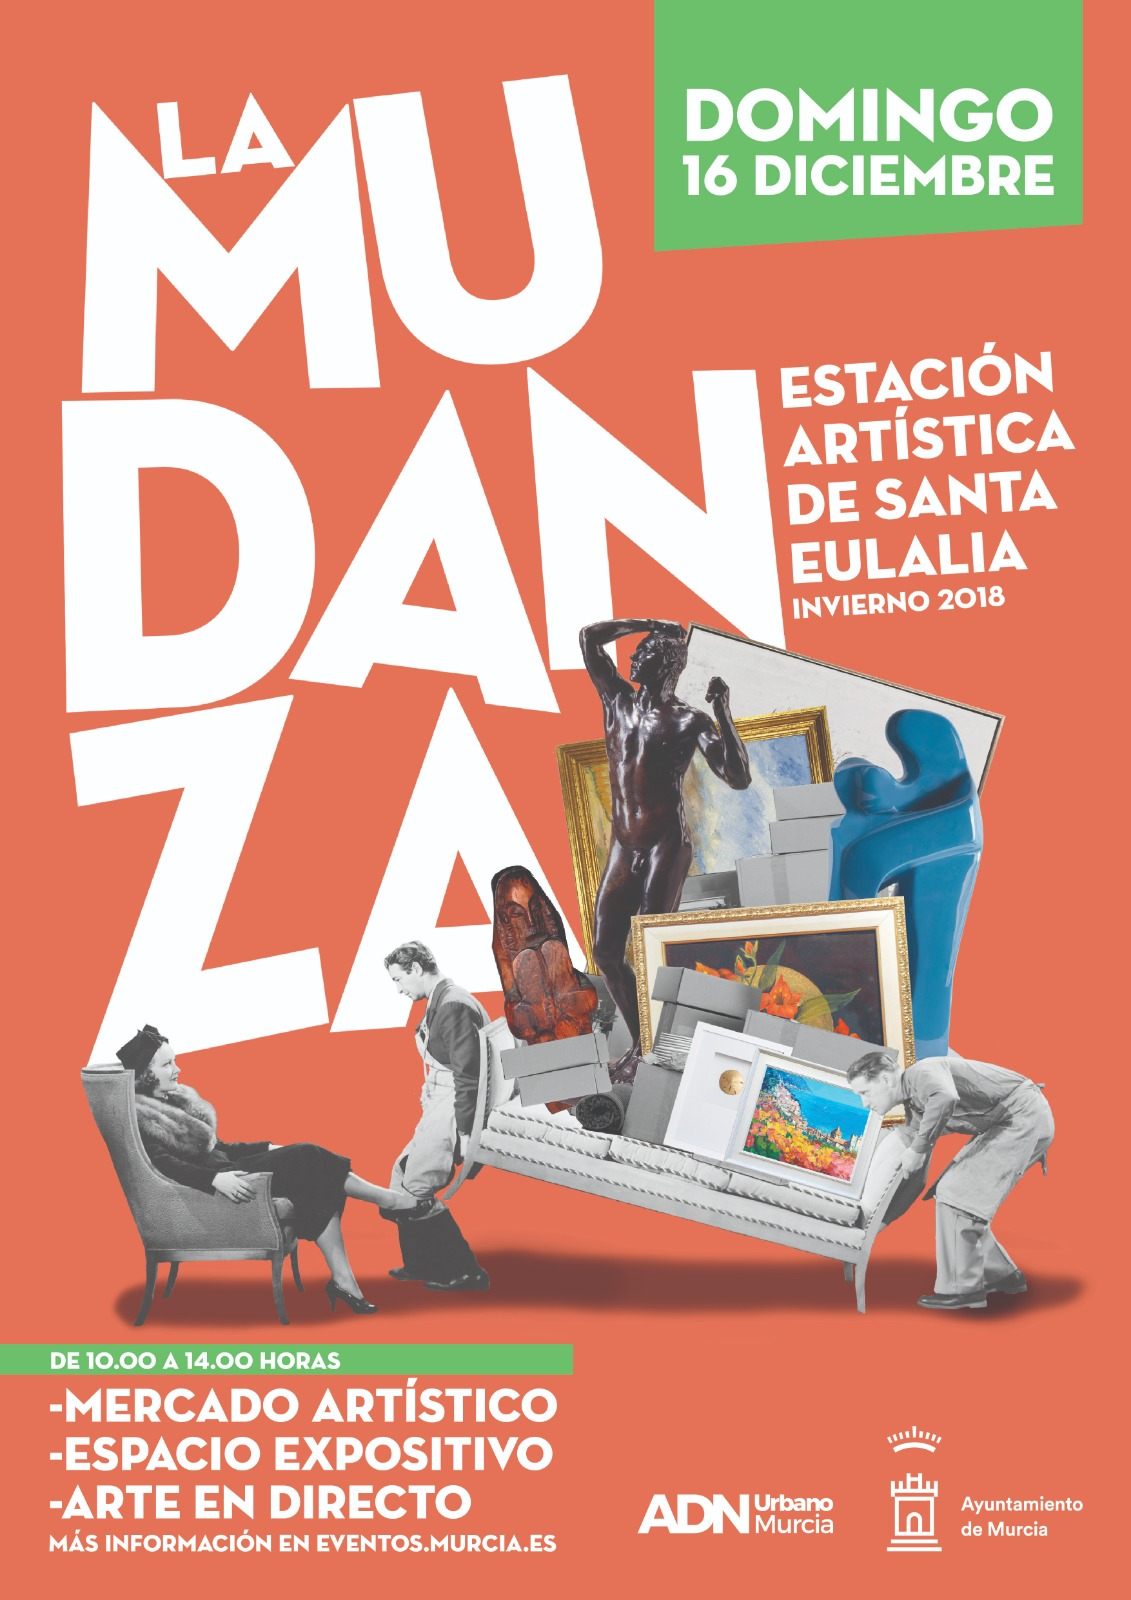 'La Mudanza' regresa a Santa Eulalia